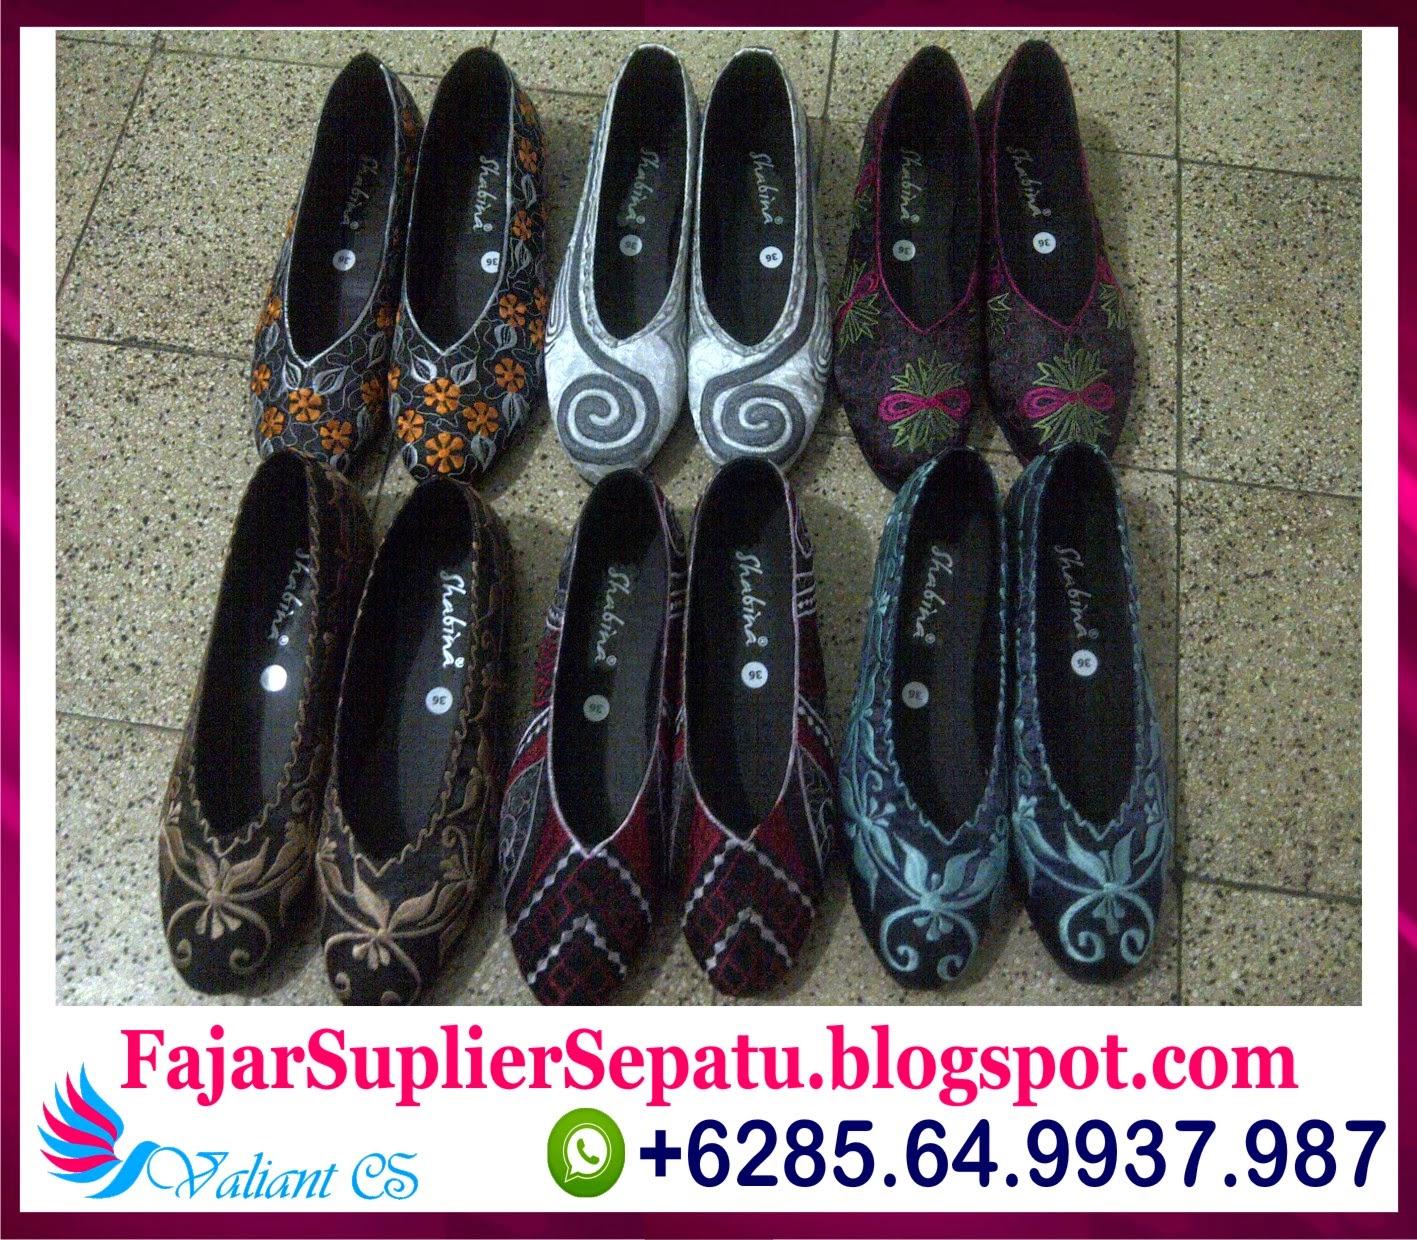 Sepatu Bordir Murah, Jual Sepatu Bordir Batik, Produsen Sepatu Bordir Bangil, +62.8564.993.7987